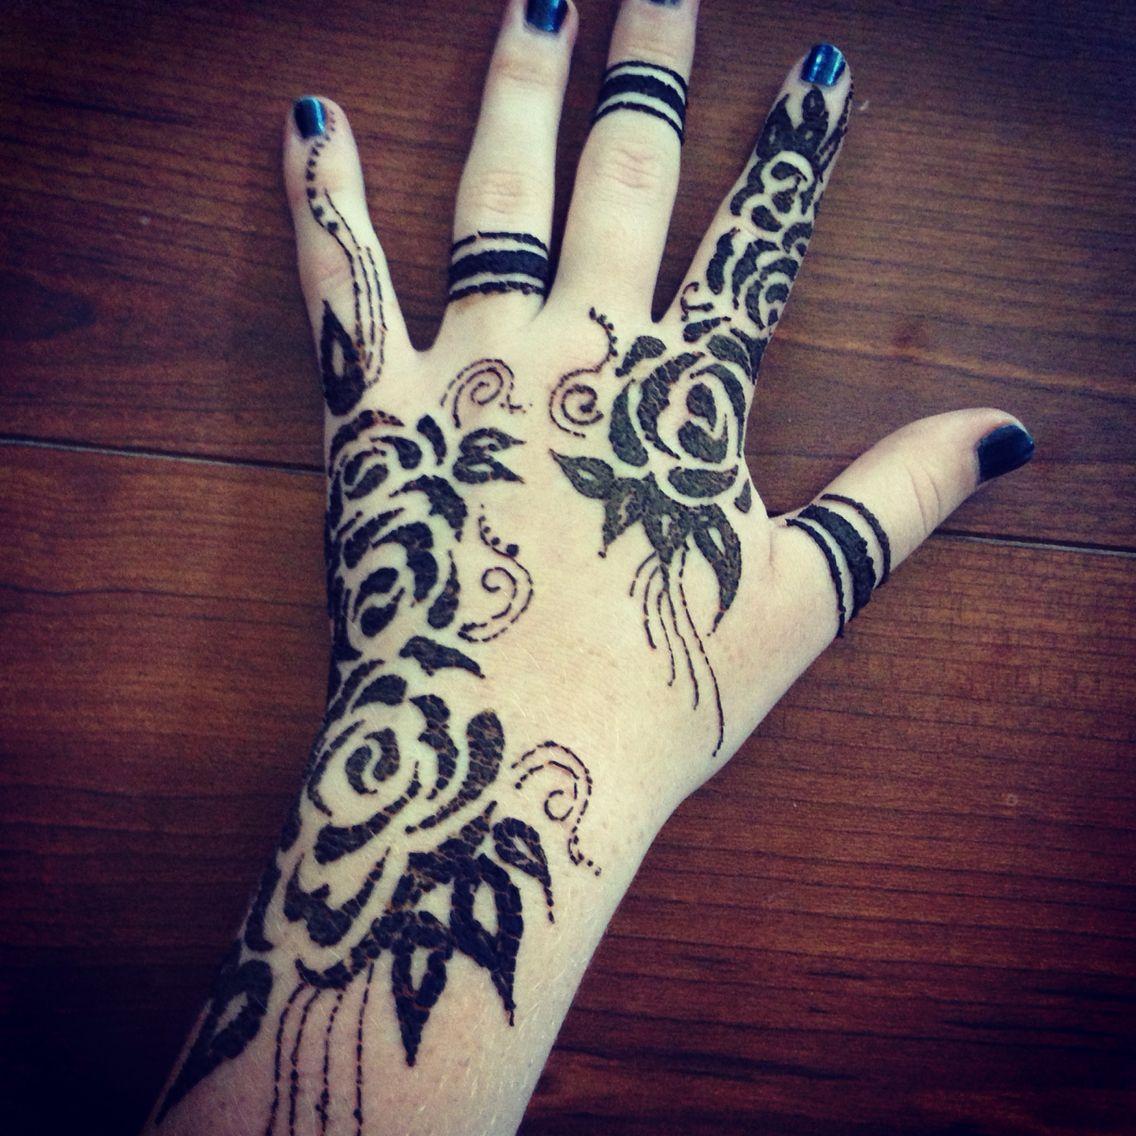 Henna Rose Tattoo by kstrawberry on DeviantArt |Realistic Rose Tattoos Henna Designs